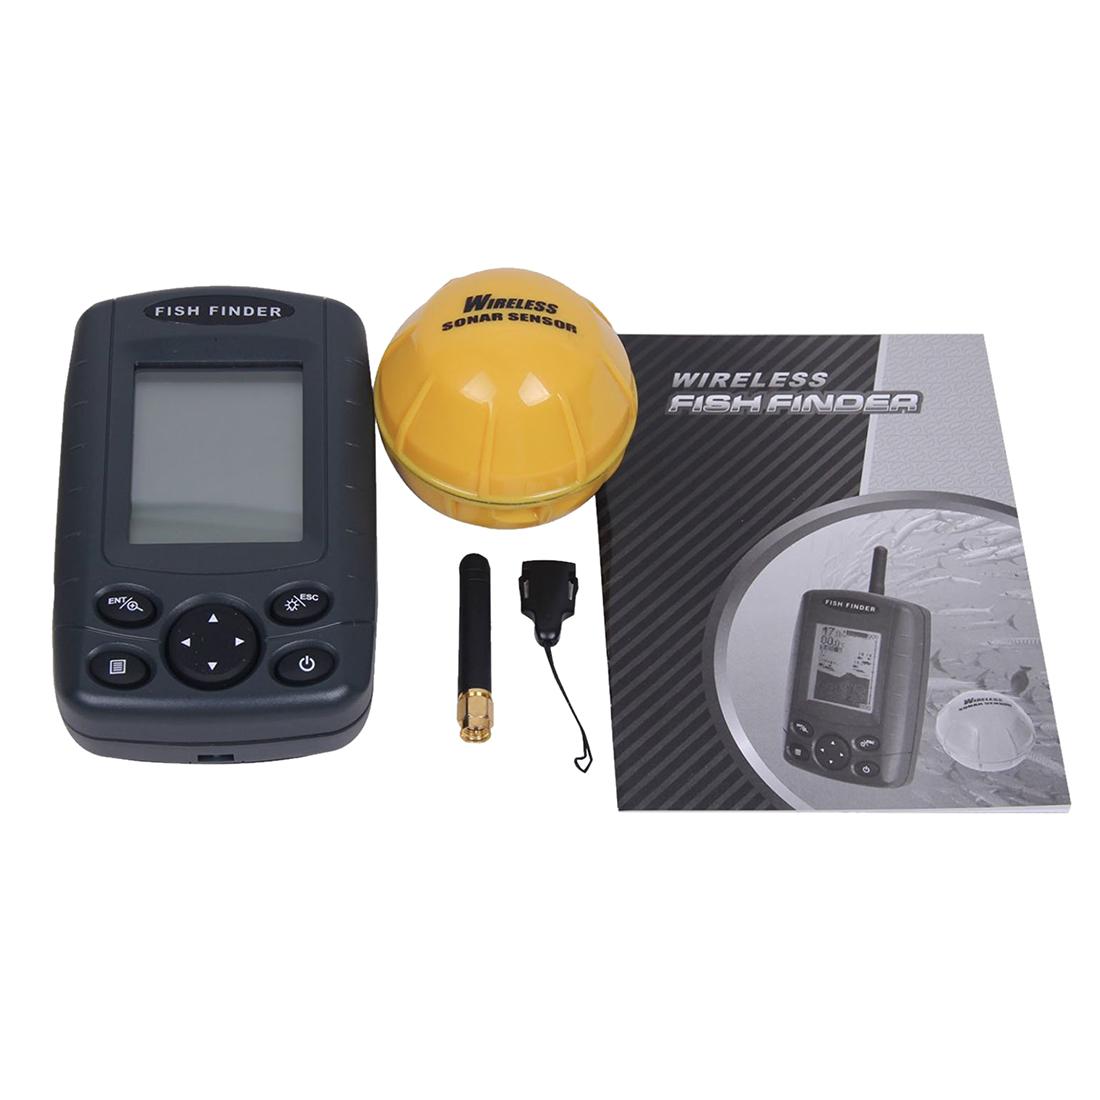 Ff 002 wireless portable handheld fish finder fishfinder for Wifi fish finder